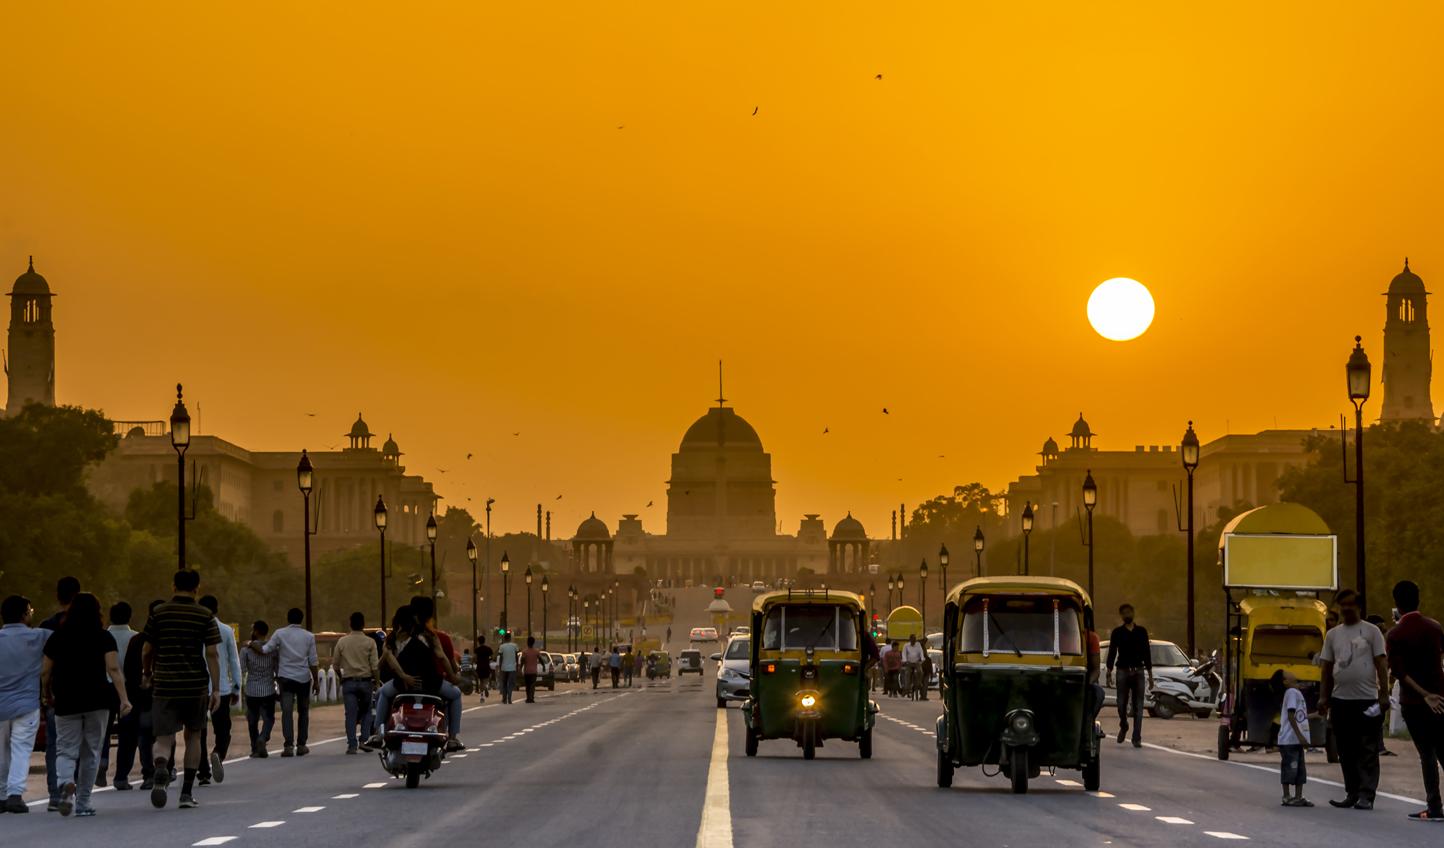 Tuk tuk your way through Delhi streets